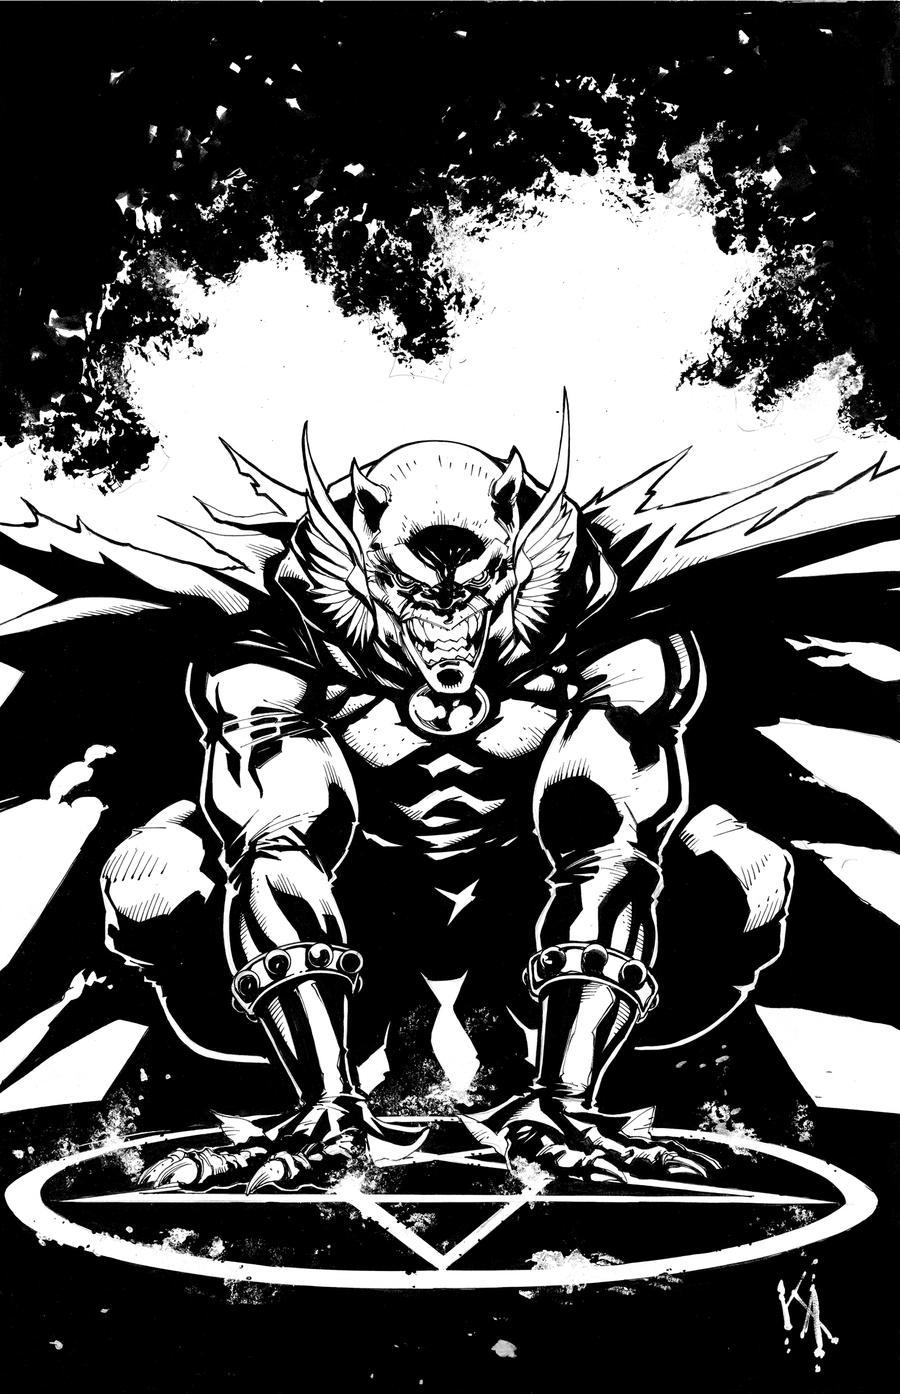 The Demon by KomicKarl